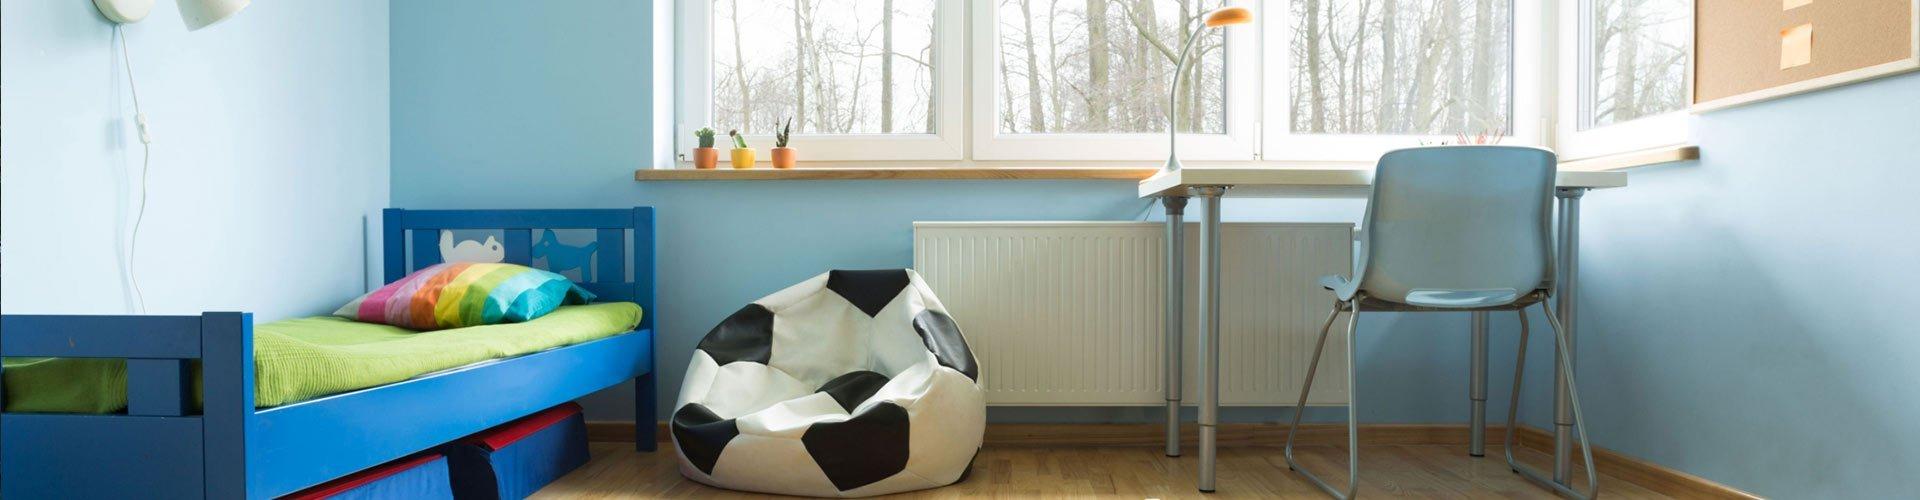 Armani Painting Boys Bedroom Blue Walls